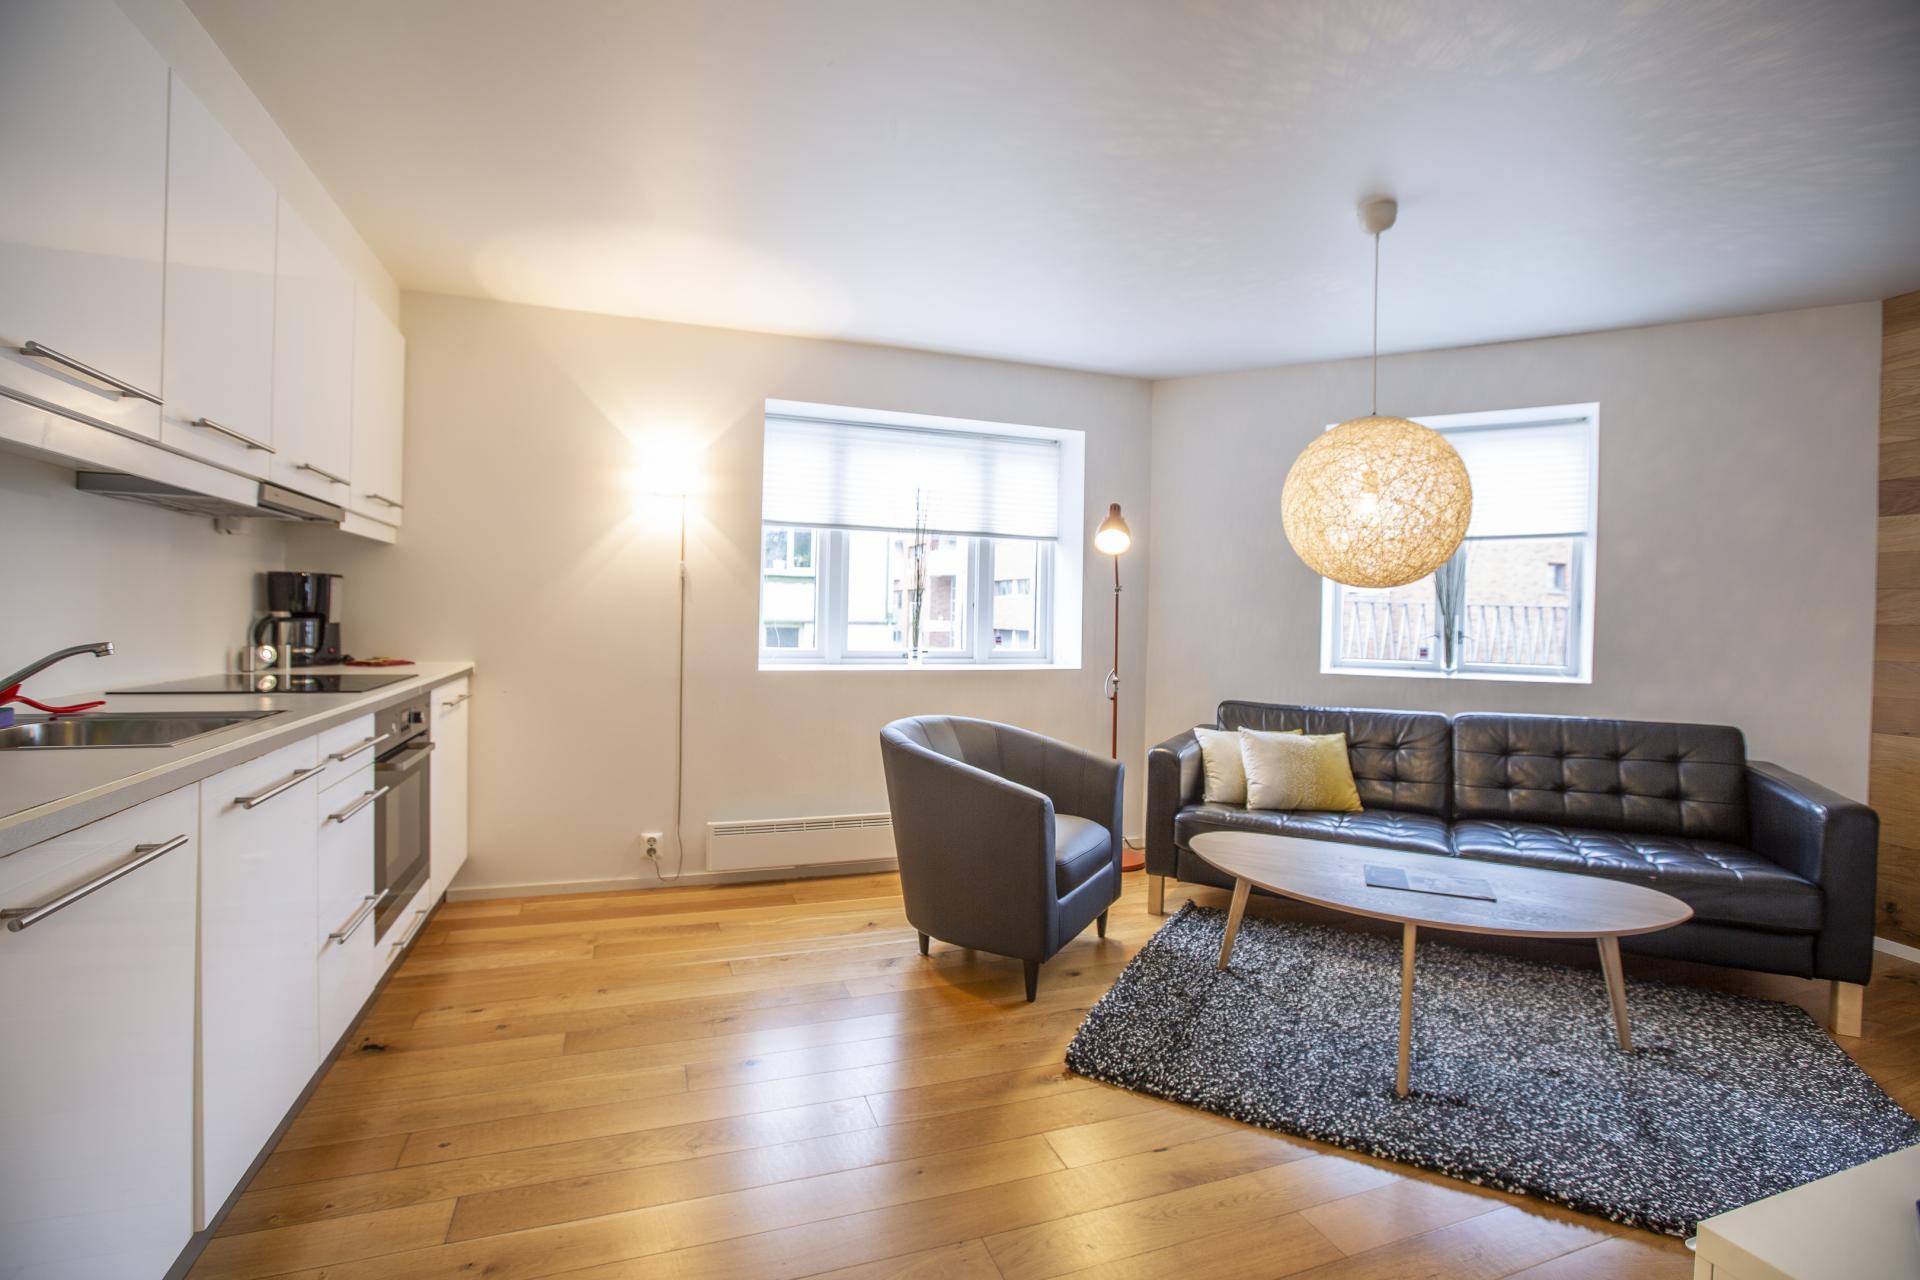 Living room at Saudagata 9 Apartment, Lagard, Stavanger